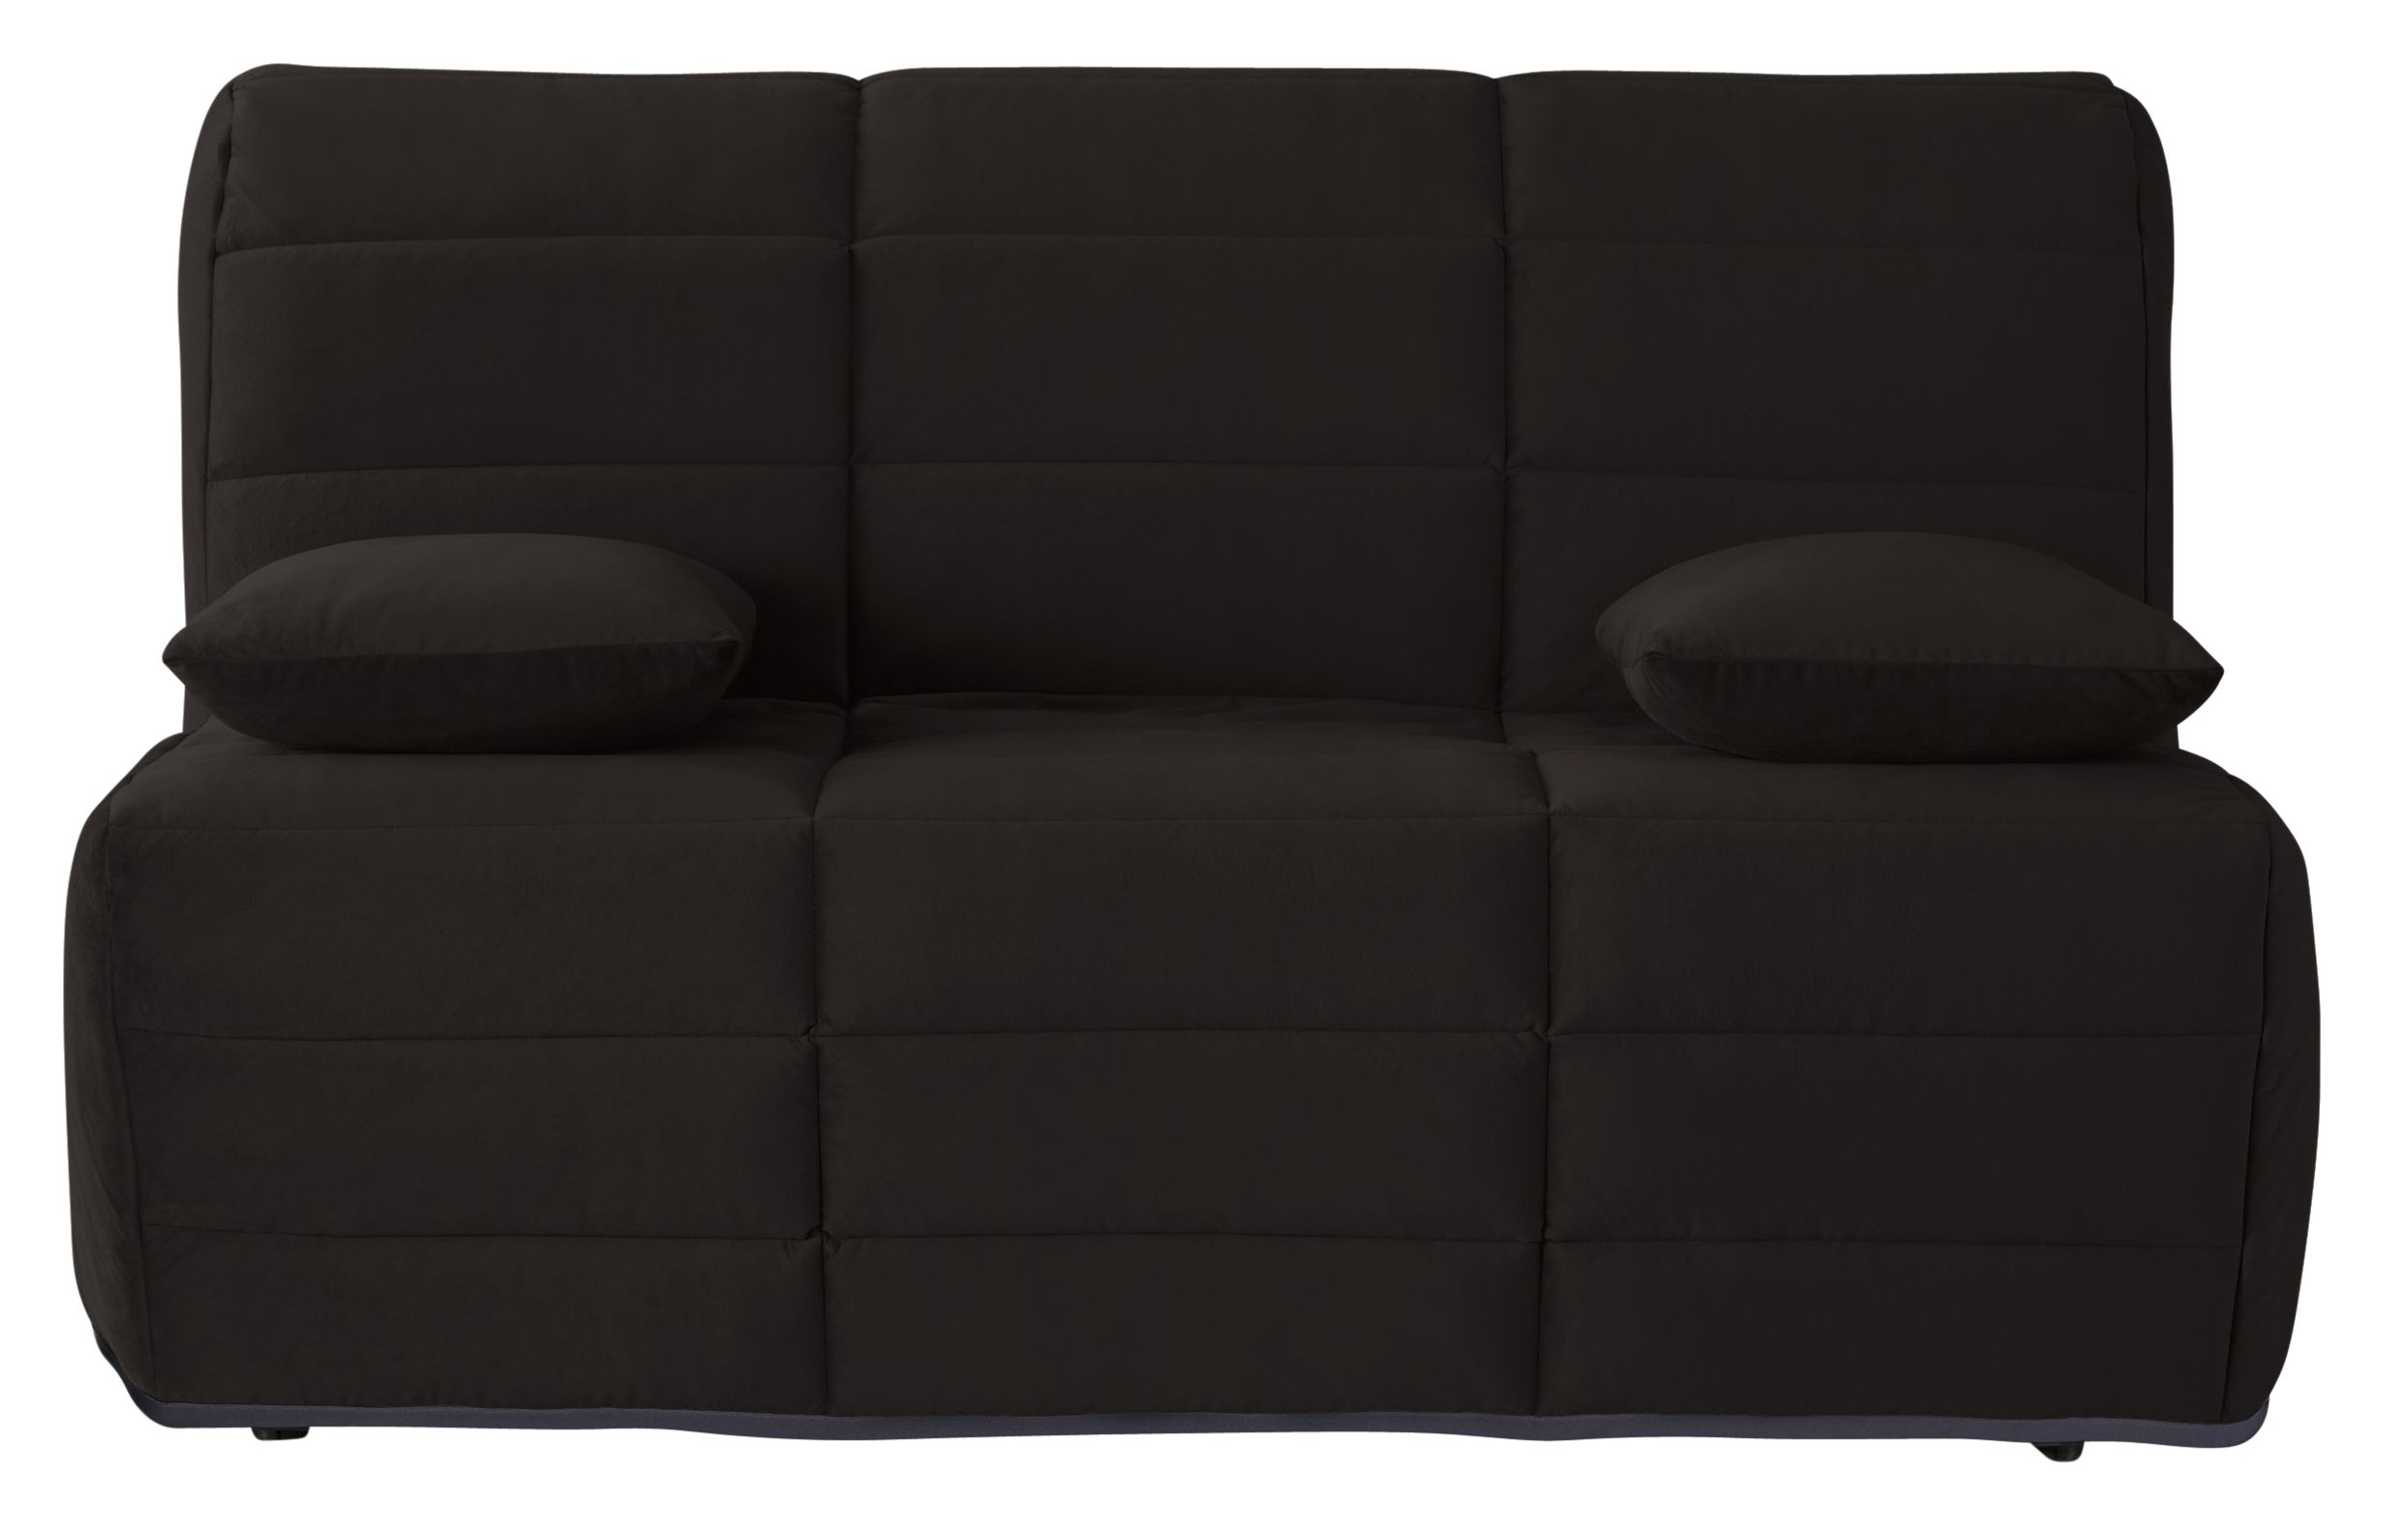 Banquette Bz Noir 160 Dunlopillo Luiz En 2020 Tissu Microfibre